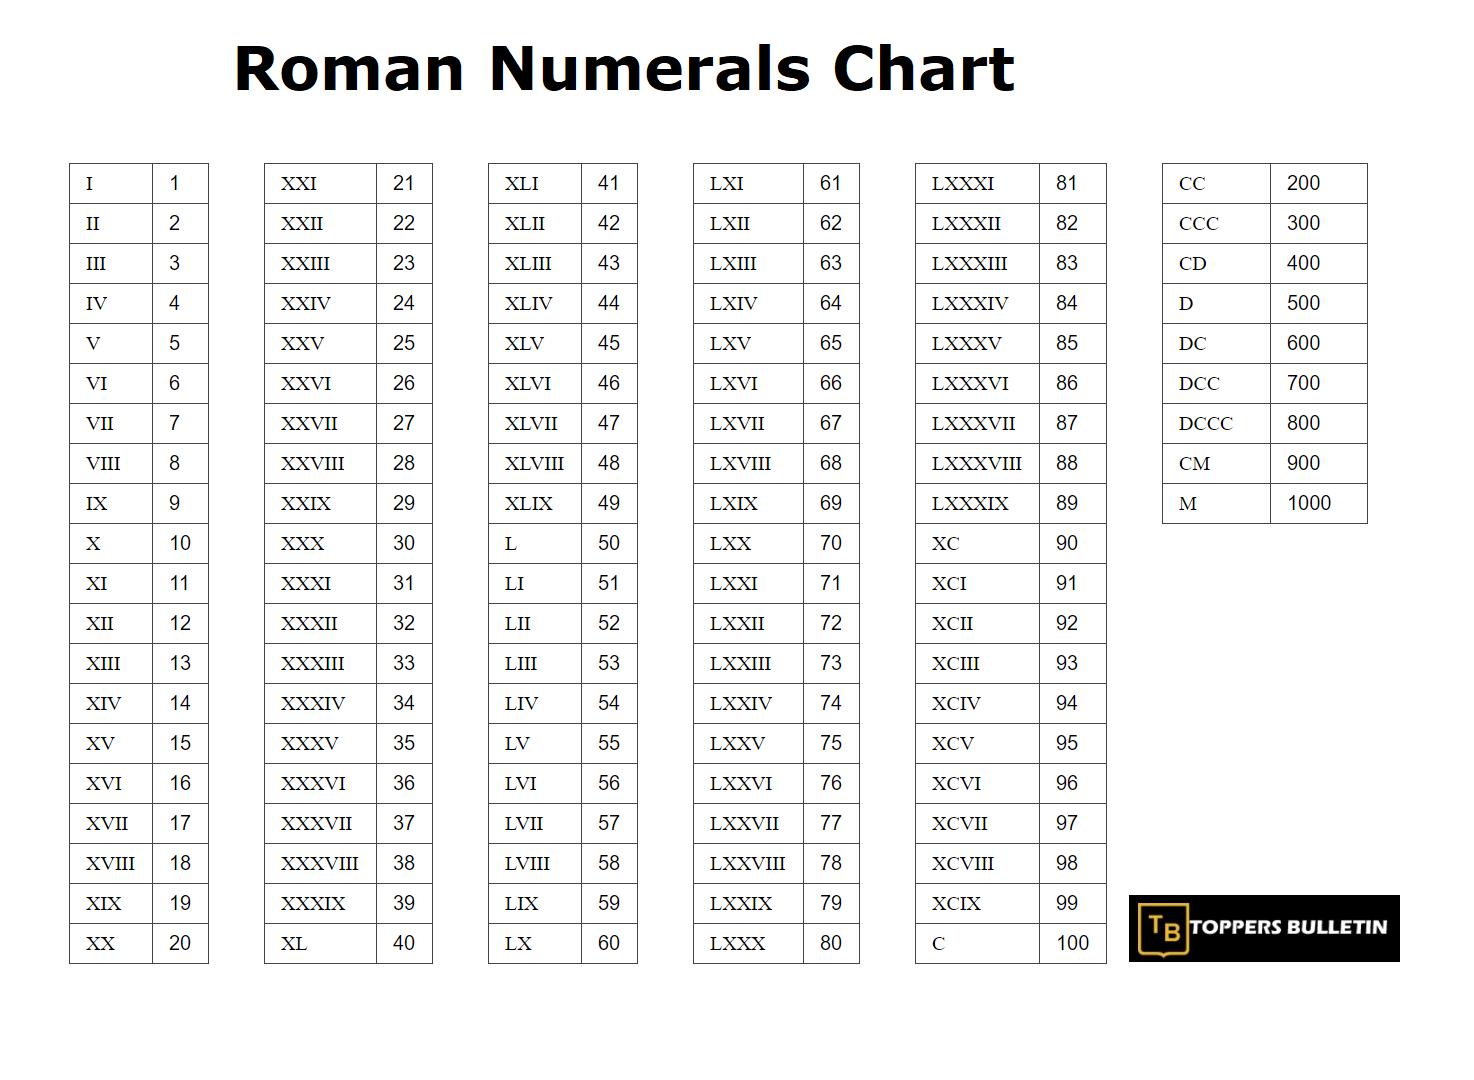 Roman Numerals Chart In